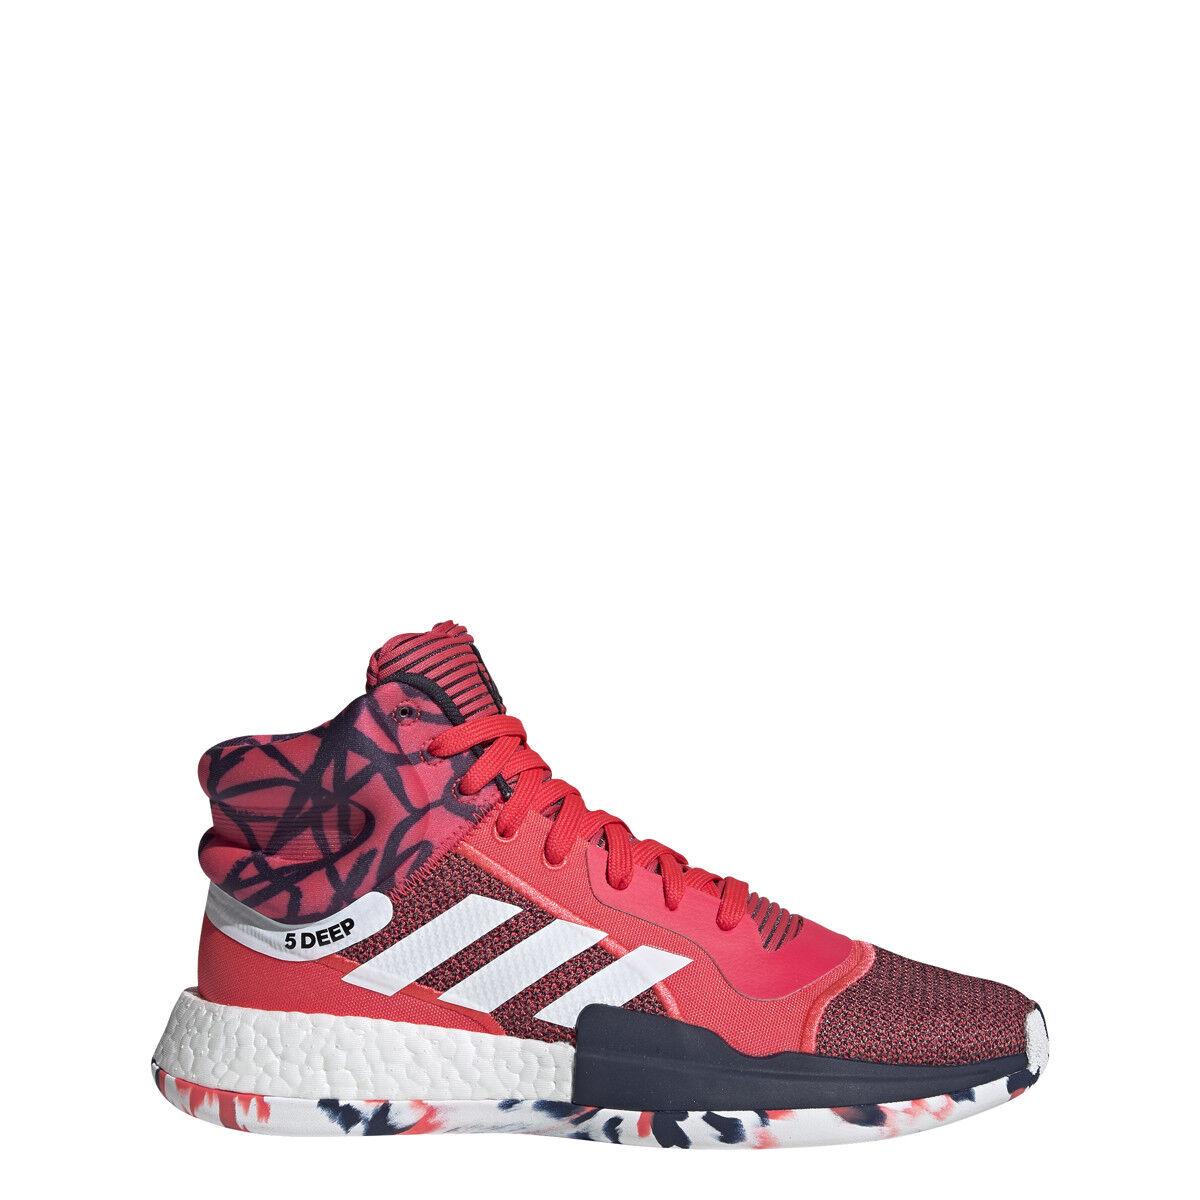 Adidas Mens MARQUEE BOOST rot Weiß Navy - G27737